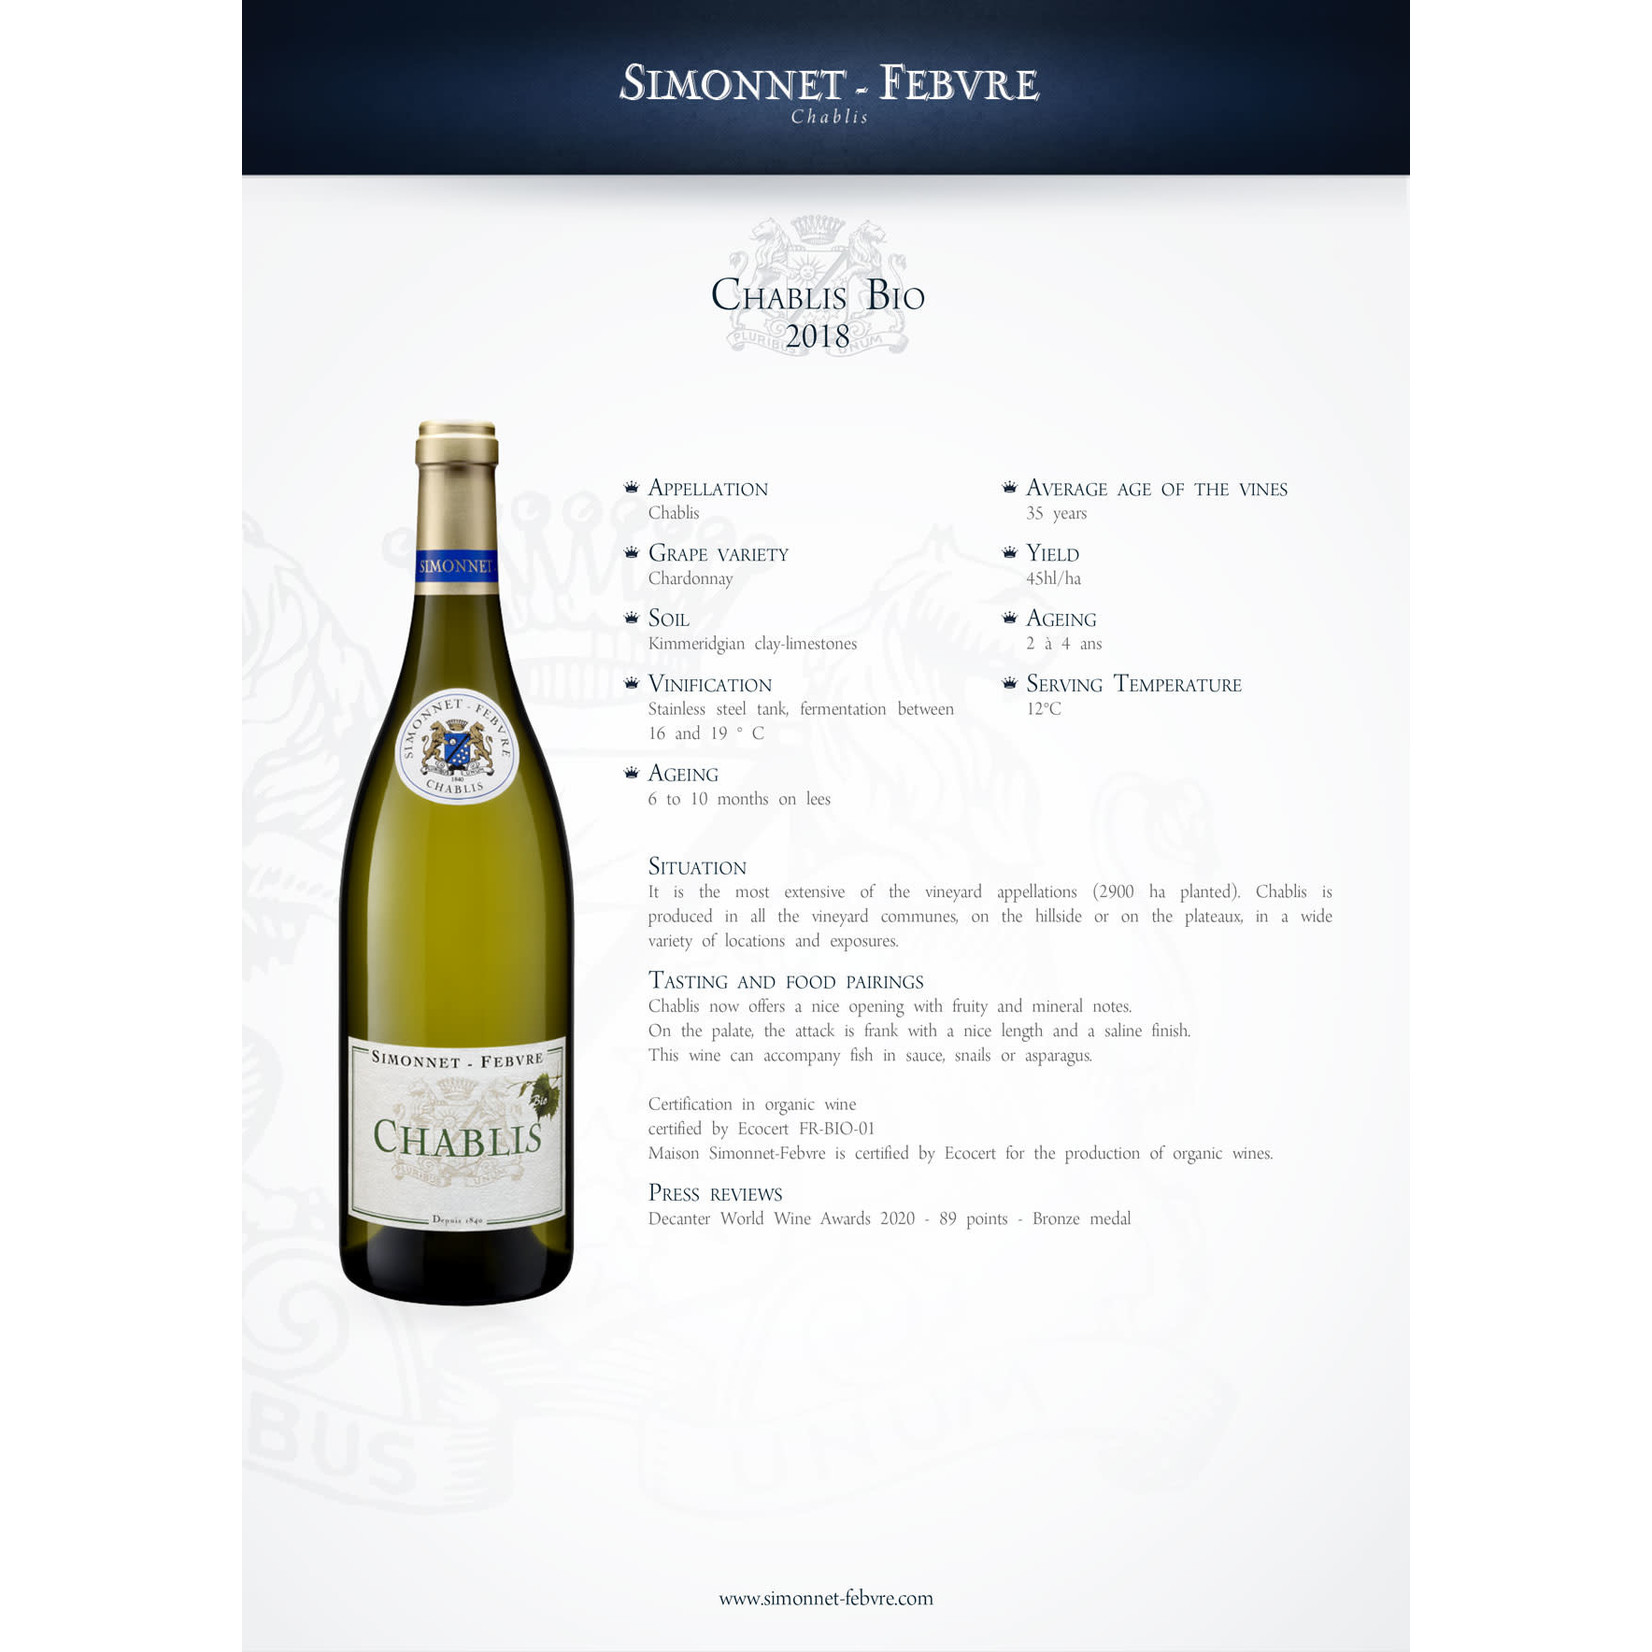 Wine Simonnet-Febvre Chablis 2018